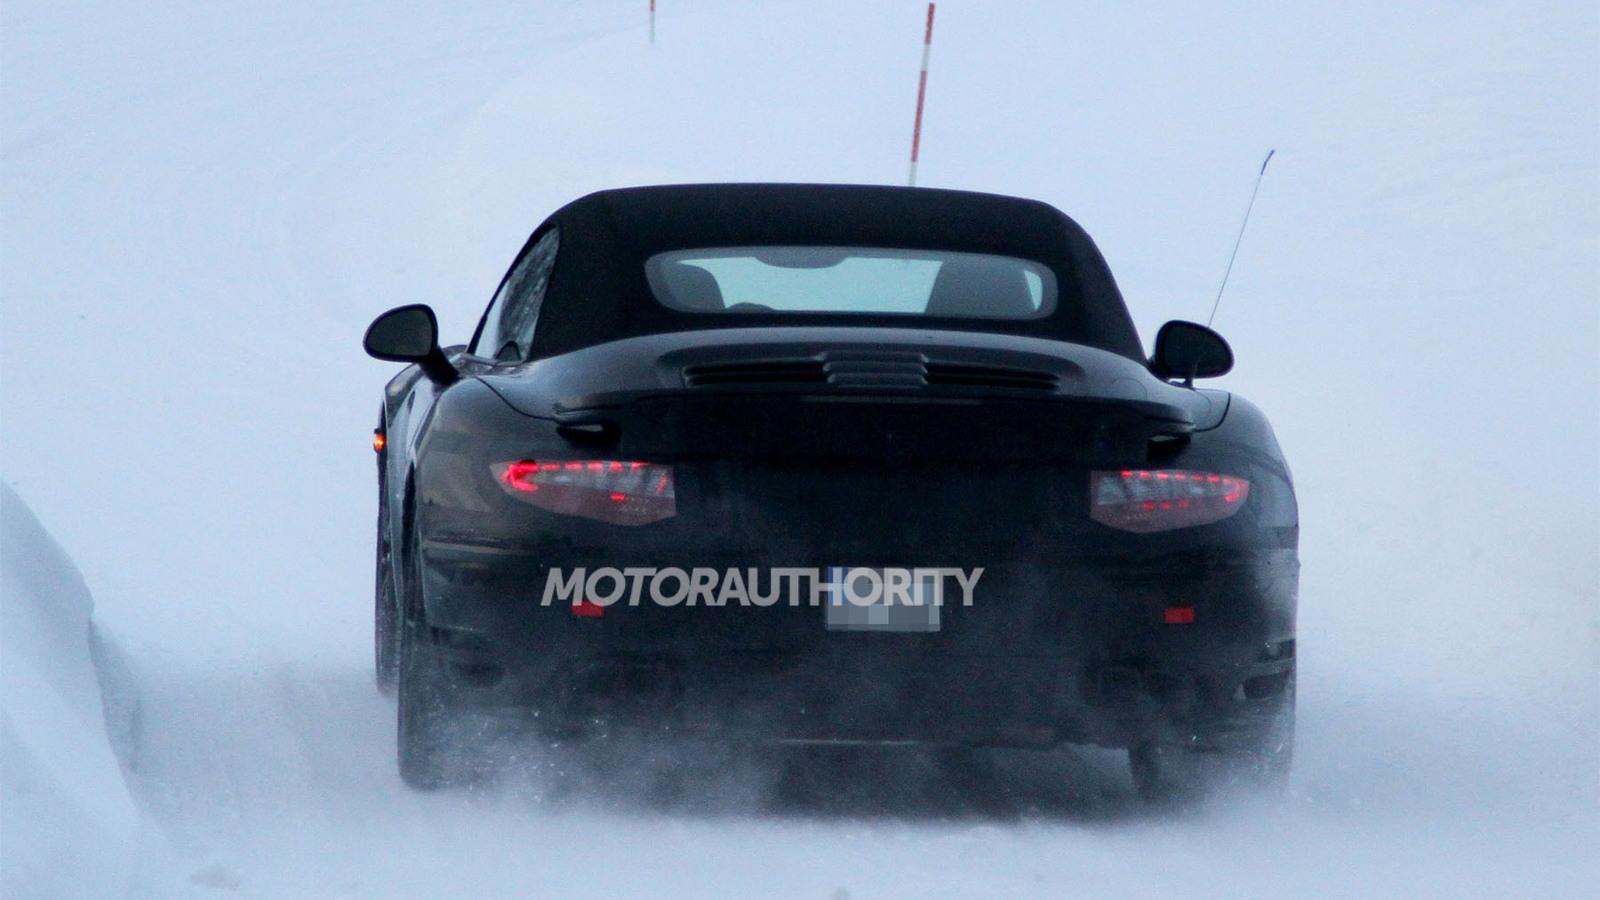 2014 Porsche 911 Turbo Cabriolet spy shots